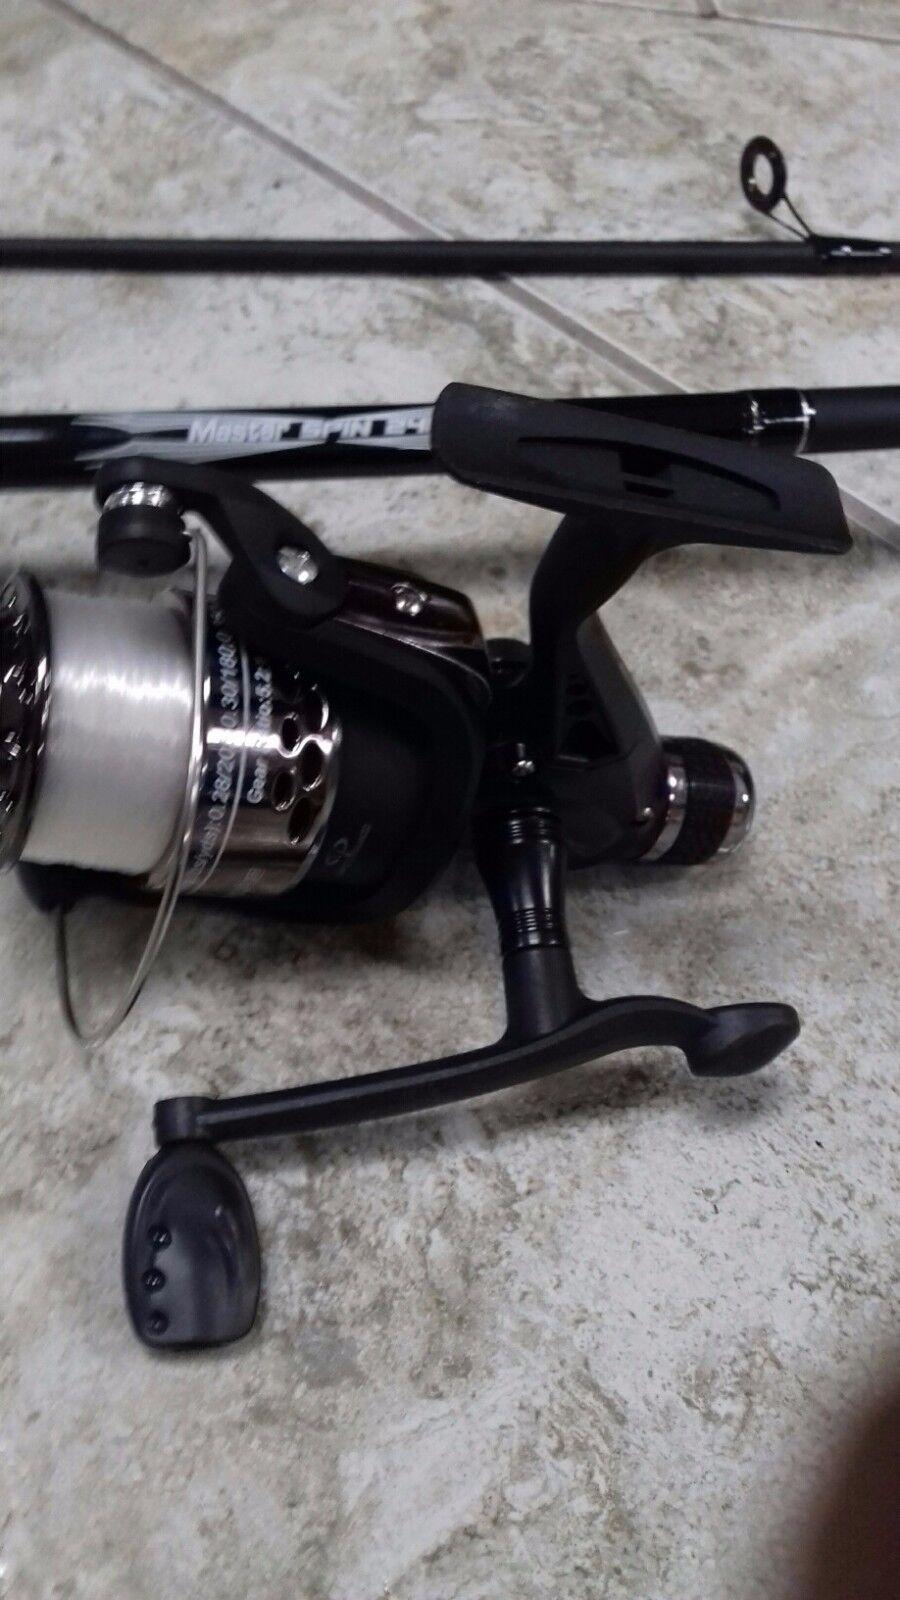 Lure fishing rod & reel Combo